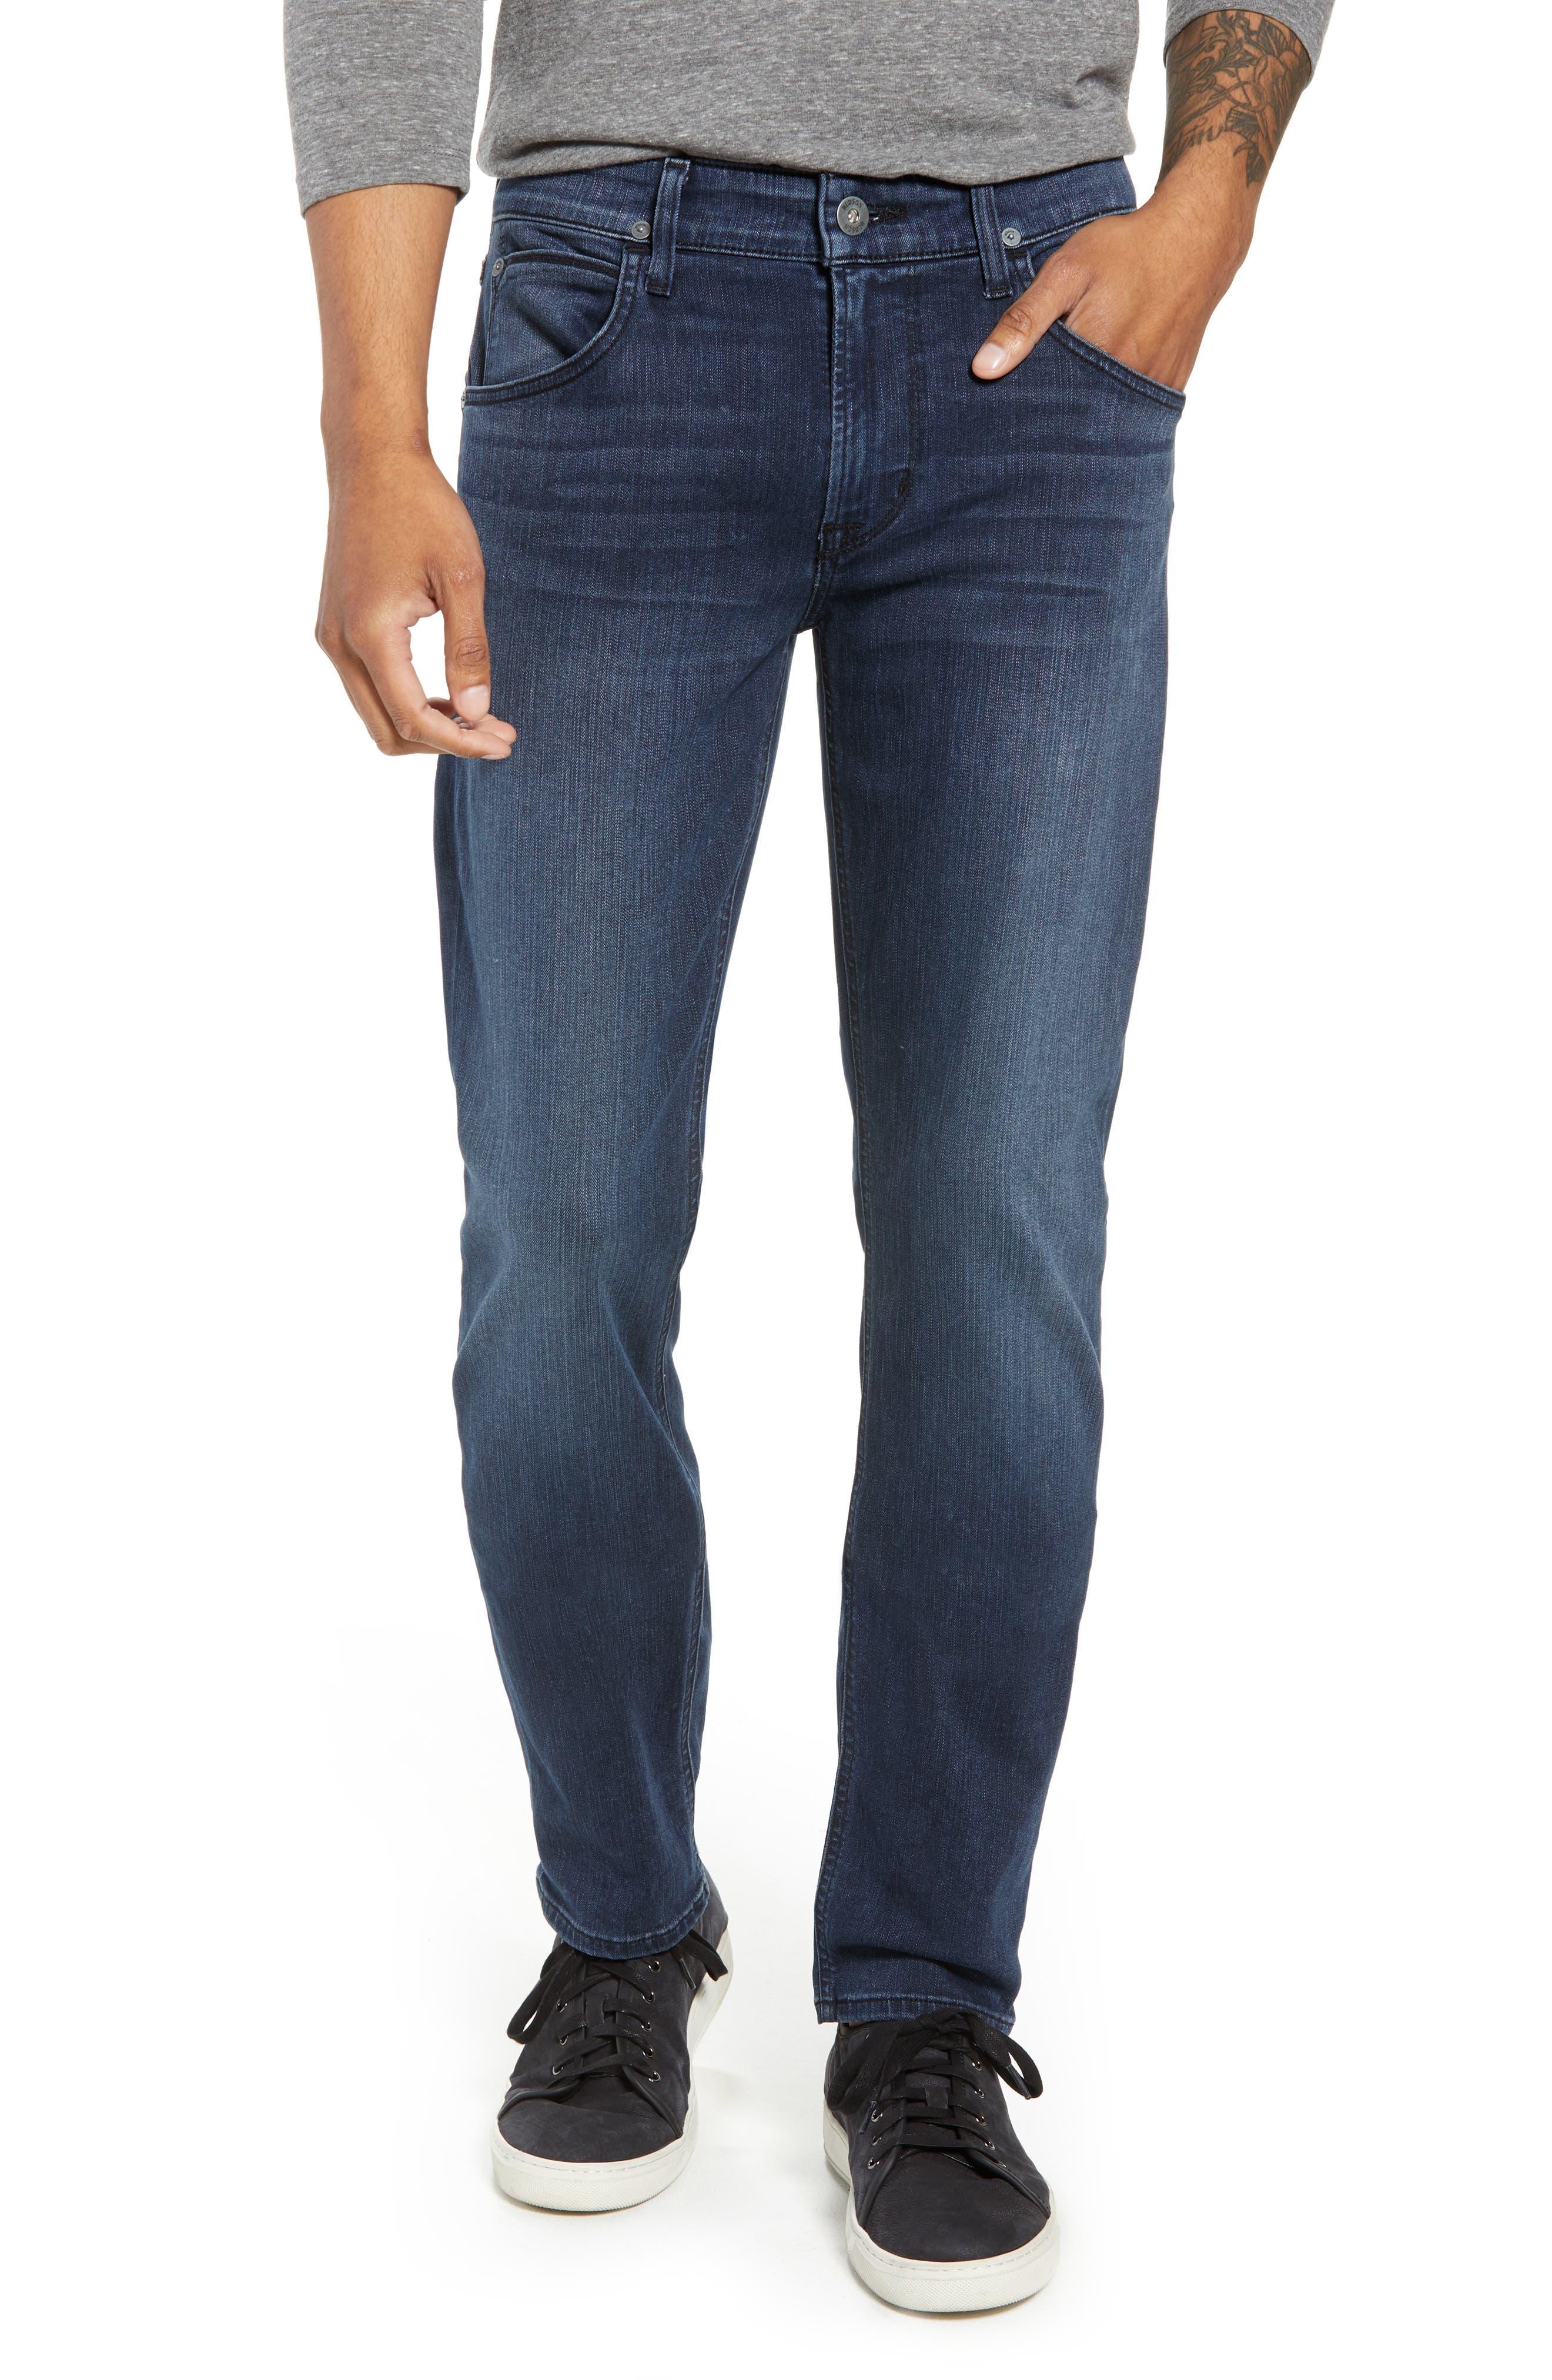 Blake Slim Fit Jeans,                         Main,                         color, Loma